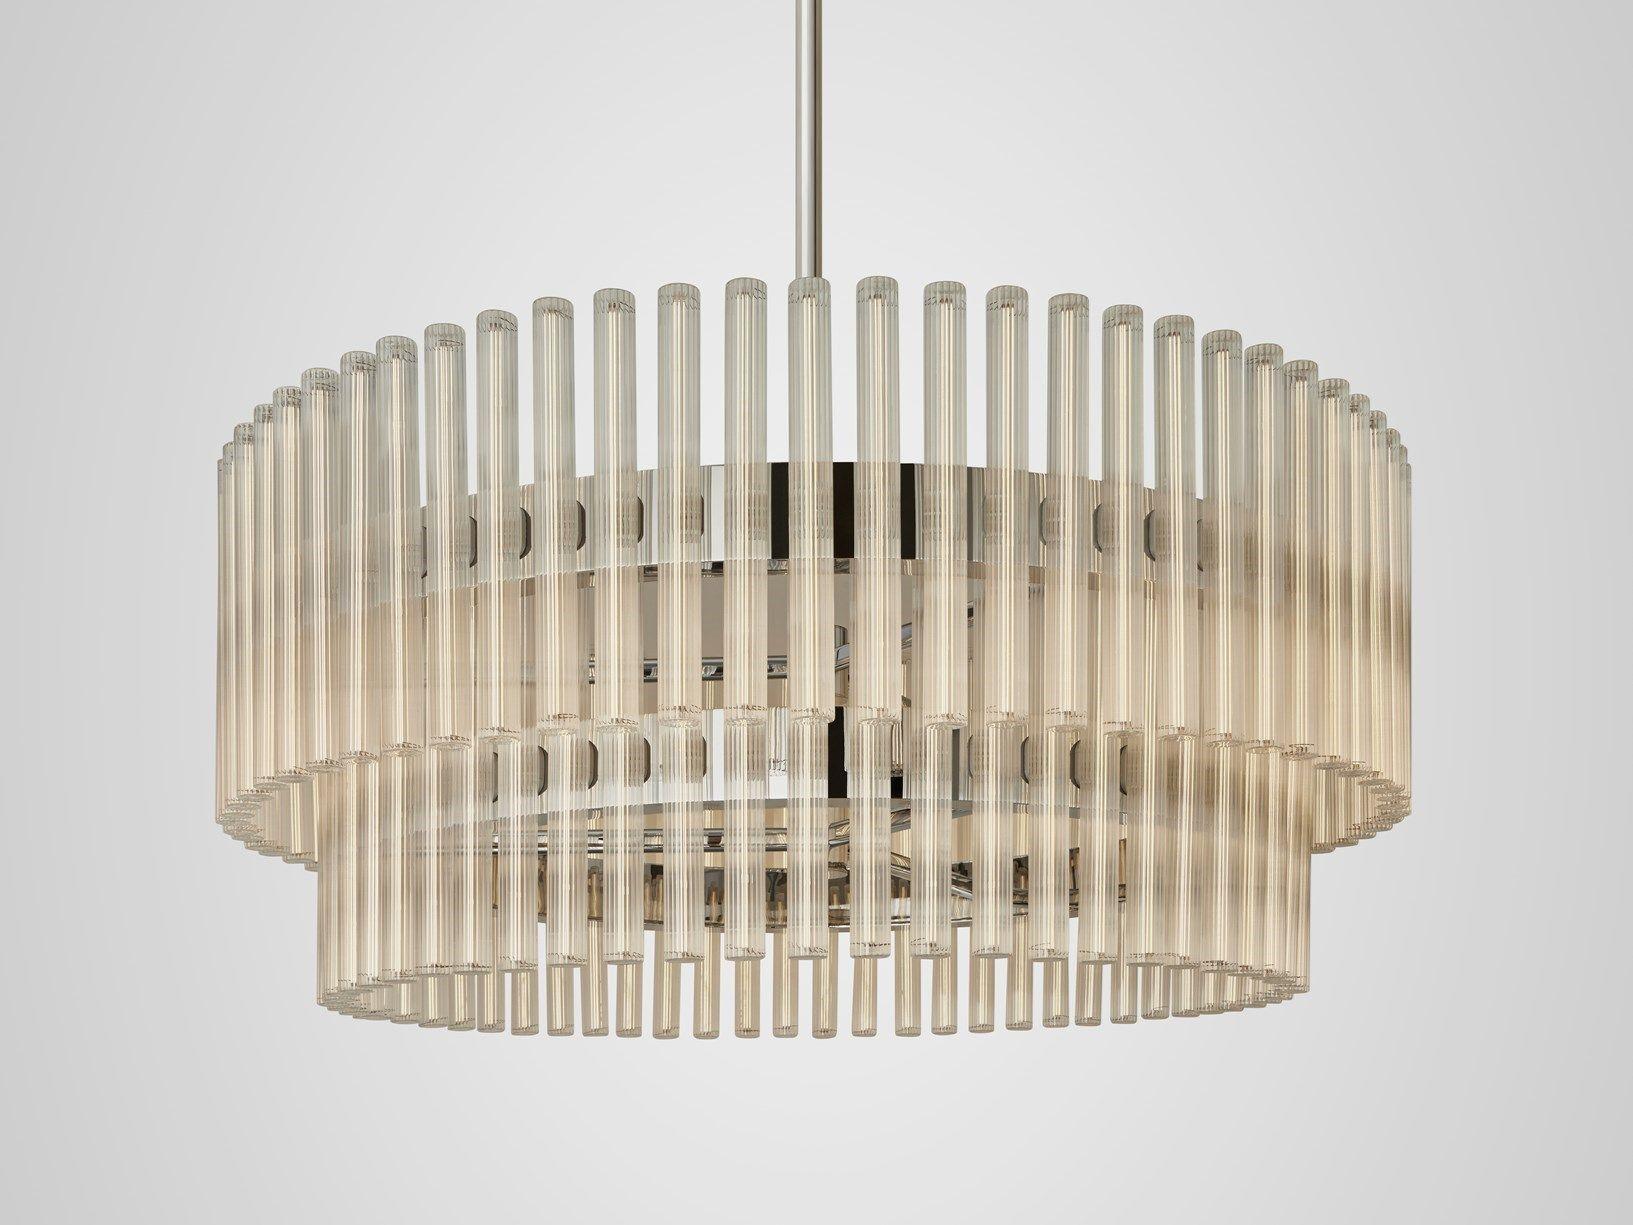 Lee Brooms Stellar Inspired Lighting Collection